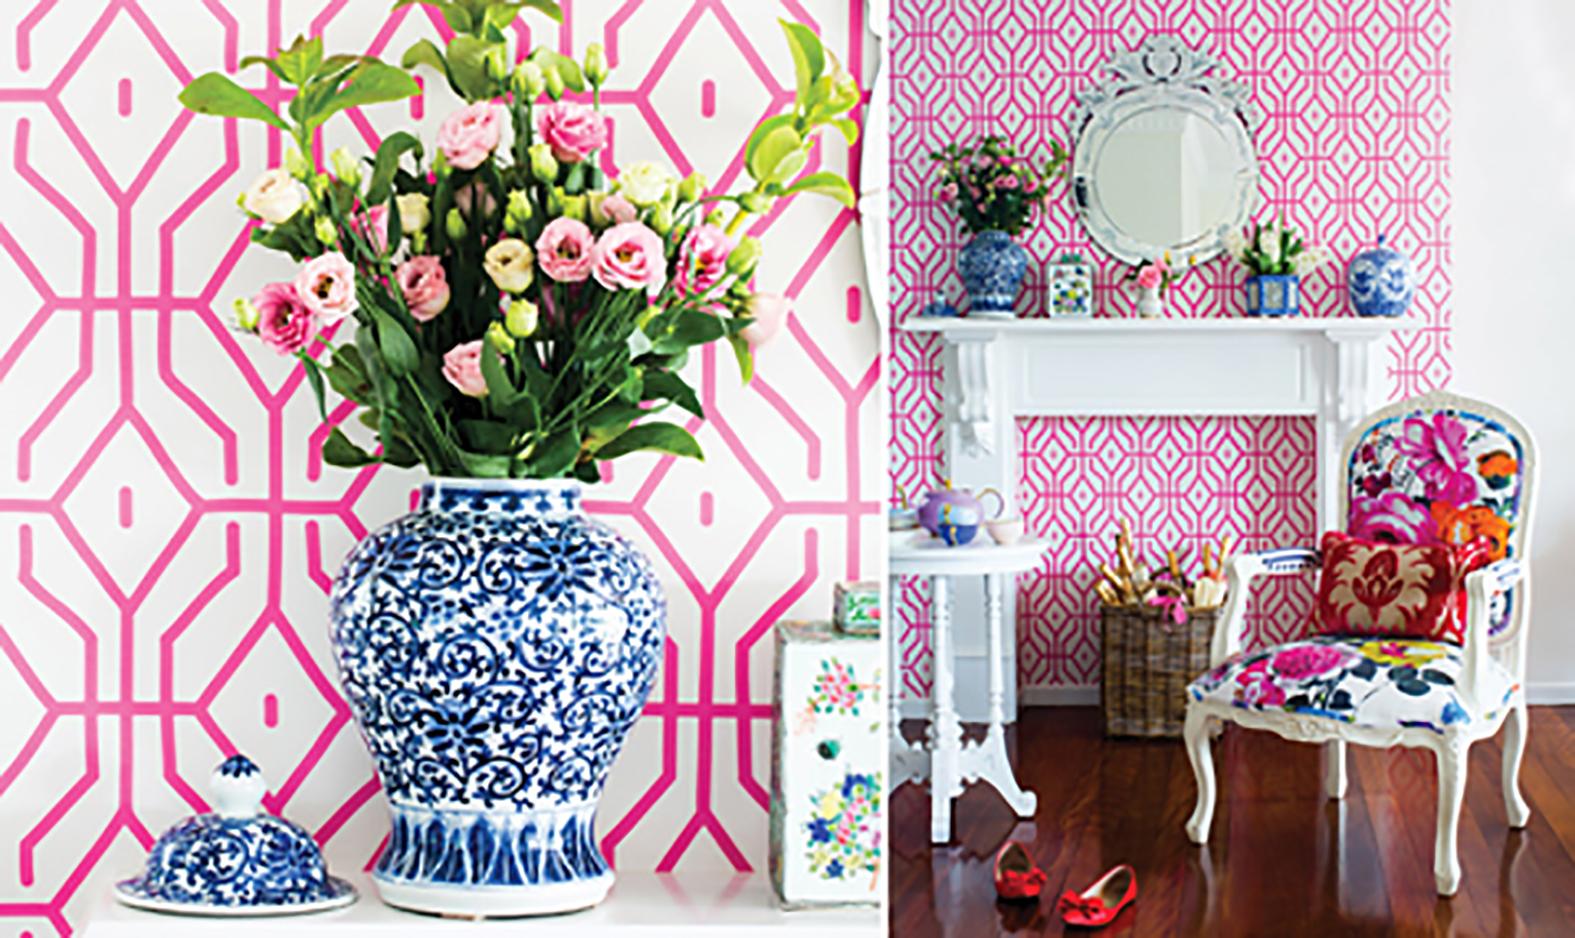 Photos from The InteriorsAddict Porters Paints NestDesigns Anna 1575x938